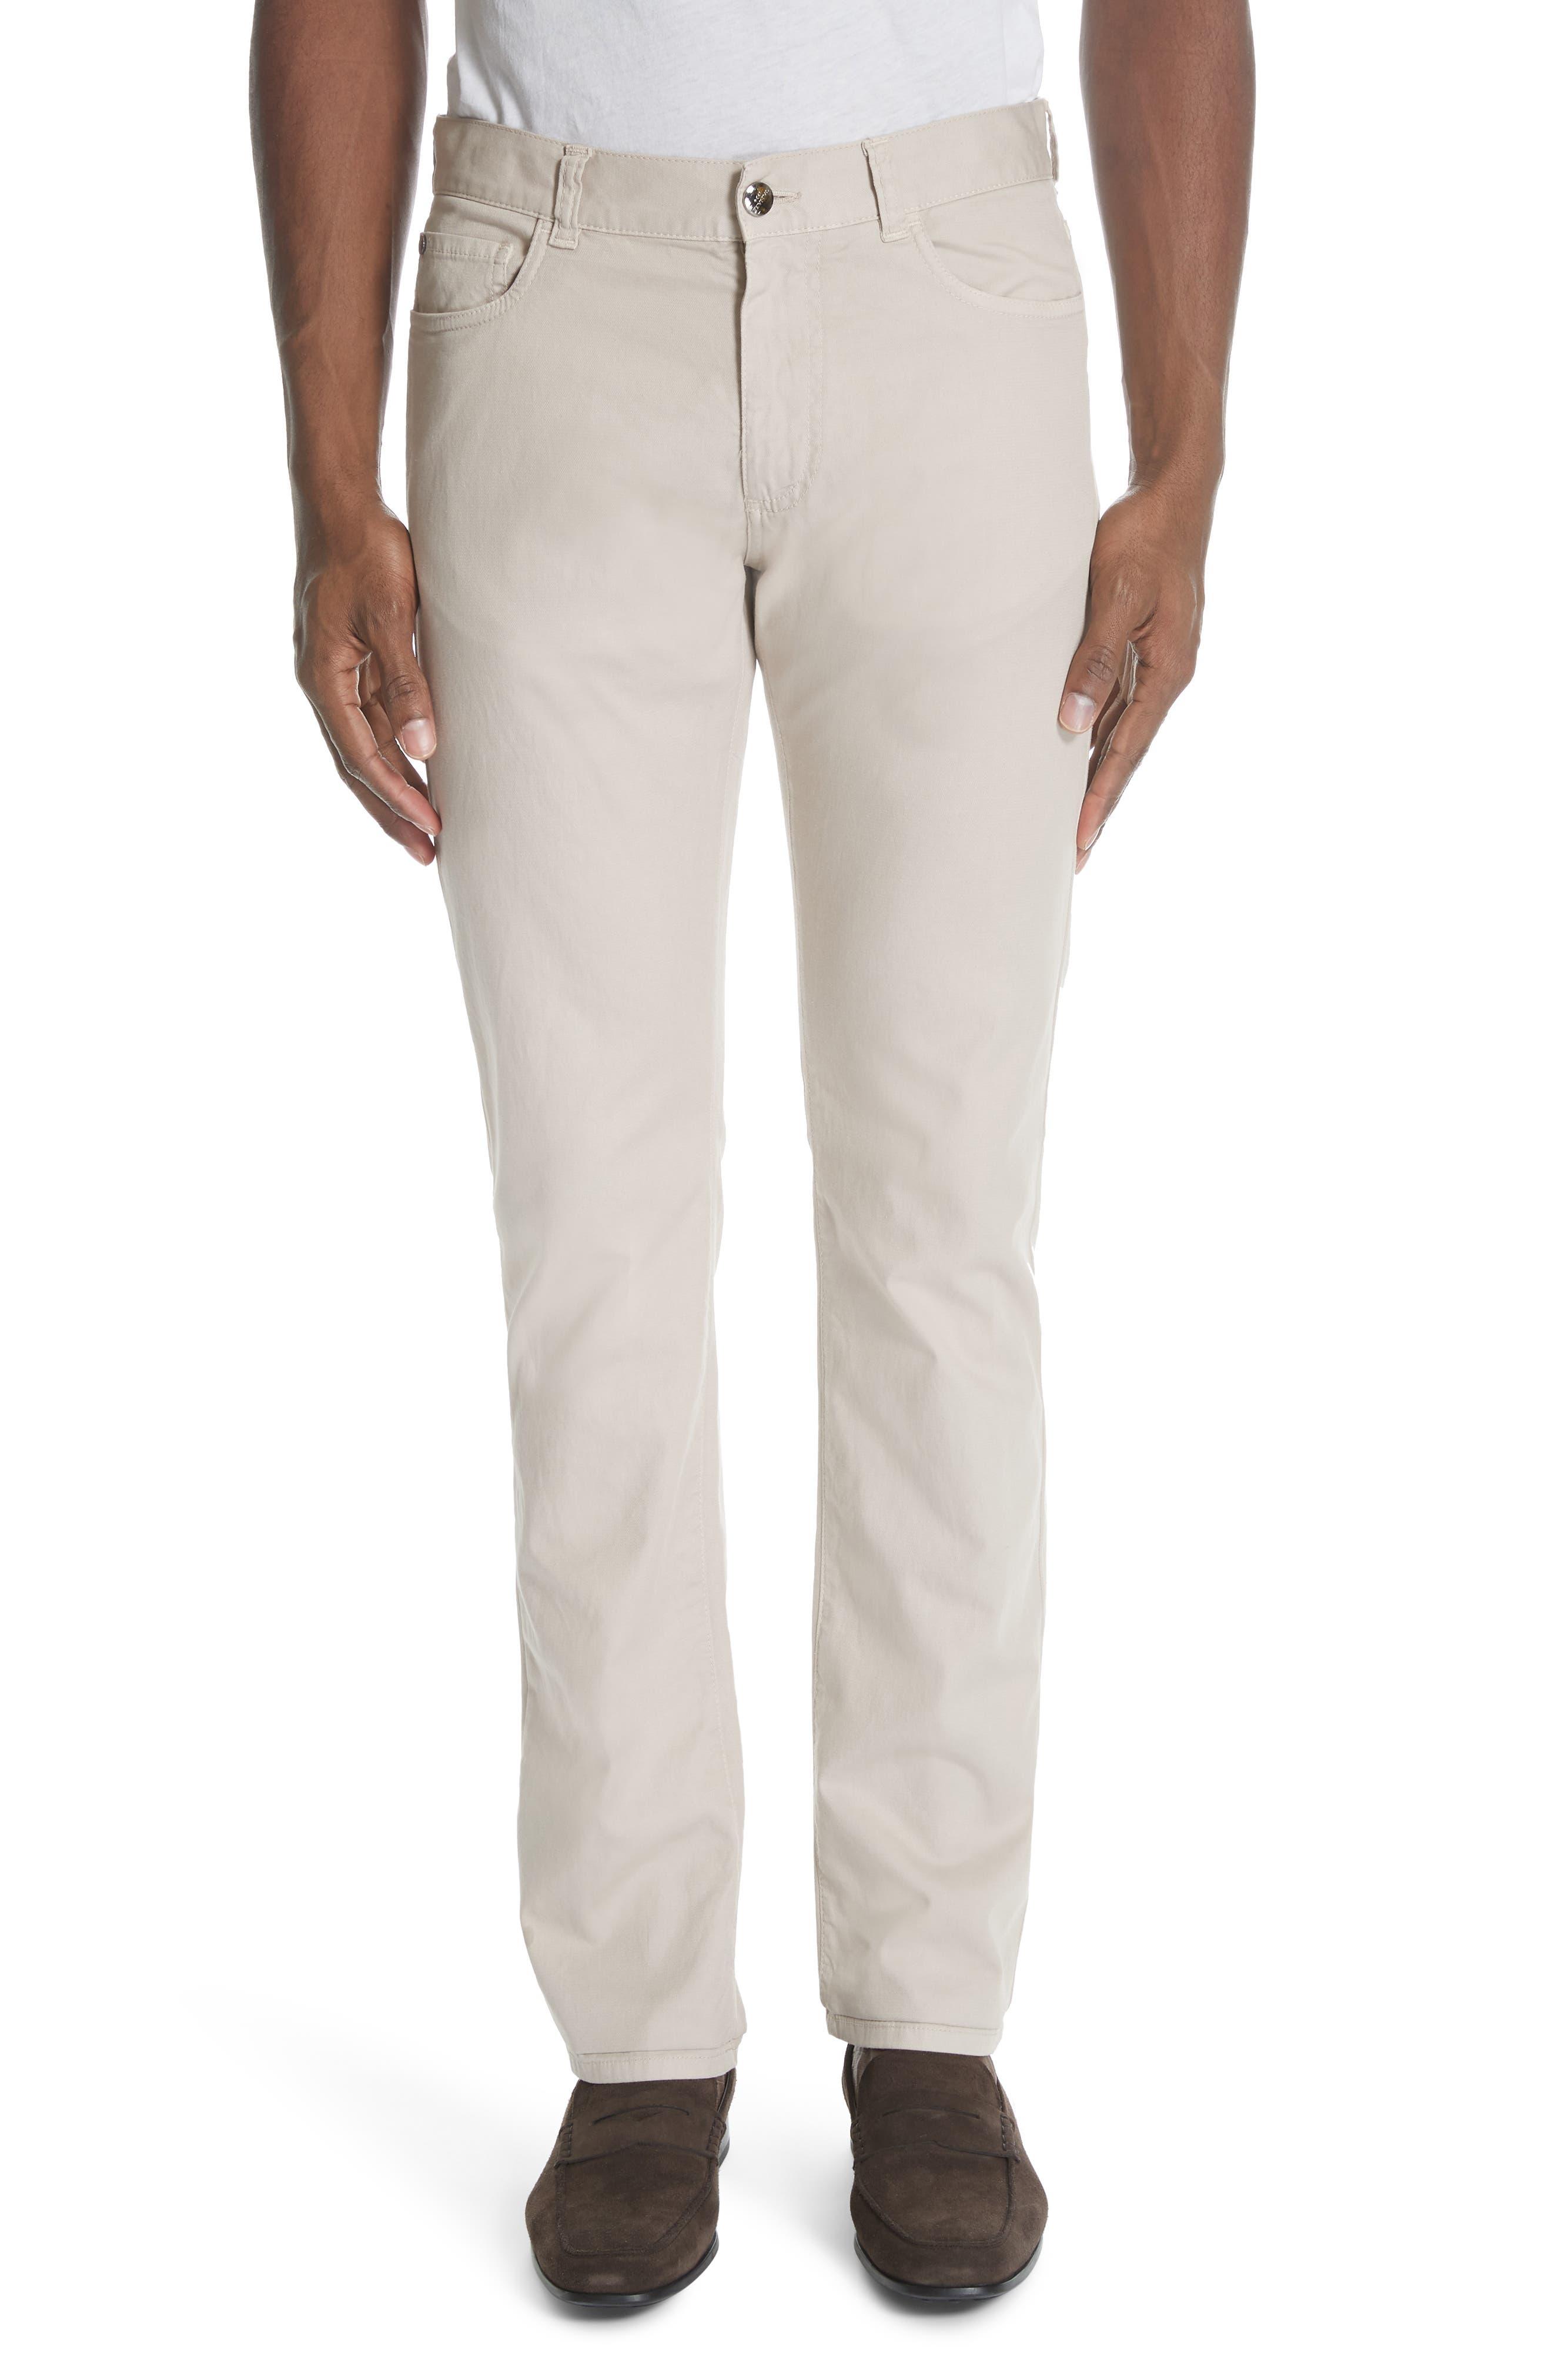 CANALI Stretch Cotton Five Pocket Trousers, Main, color, BEIGE